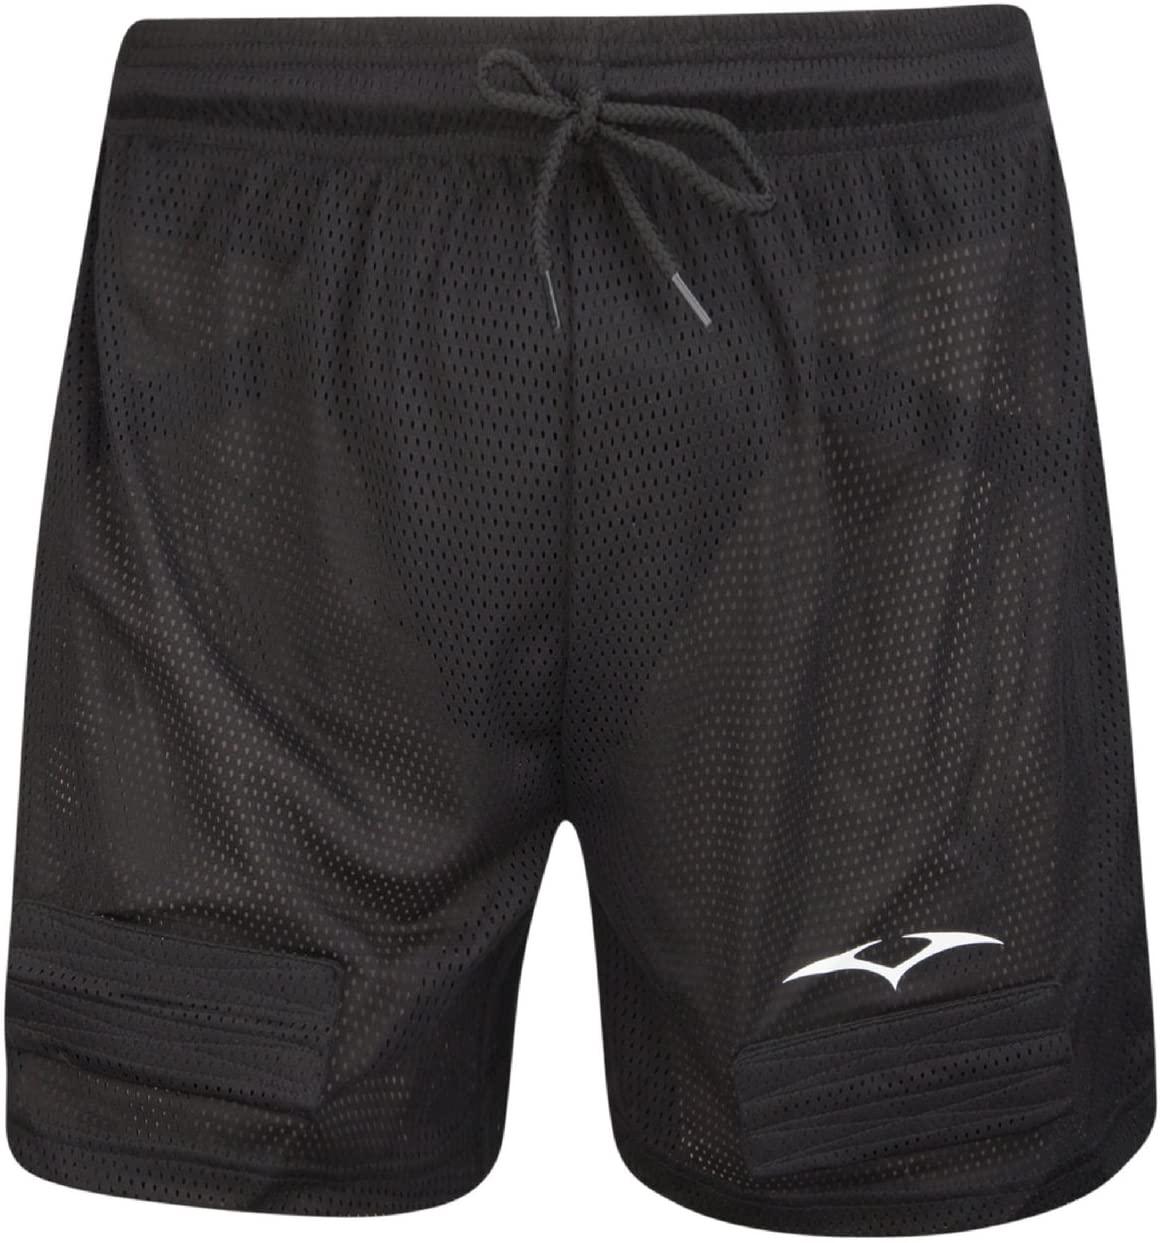 Vic's Hockey Pro Athletic Jock Shorts, Black, Youth